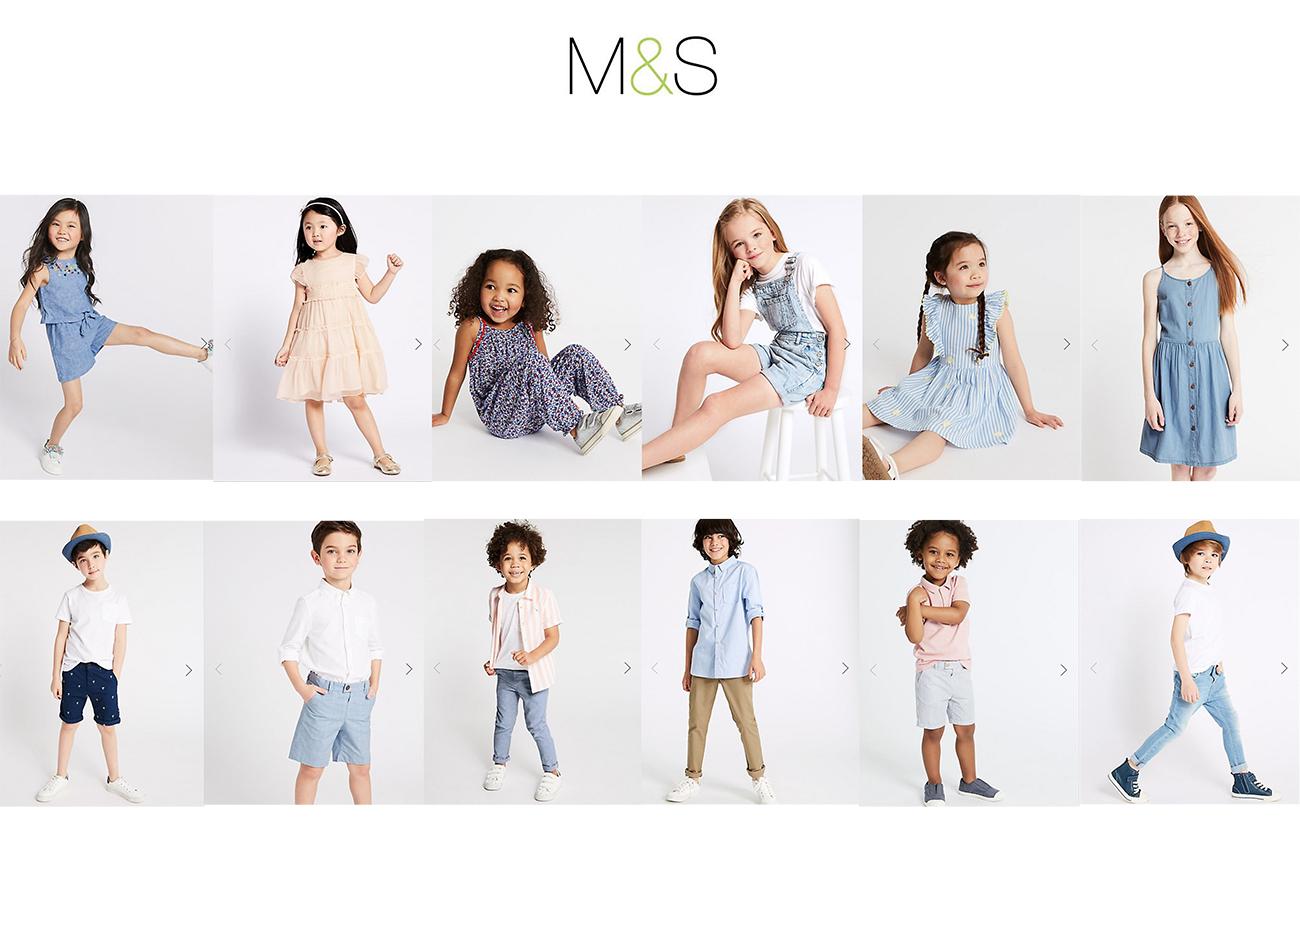 M&S Outfit Guide Bluebells Helen Rowan Photography